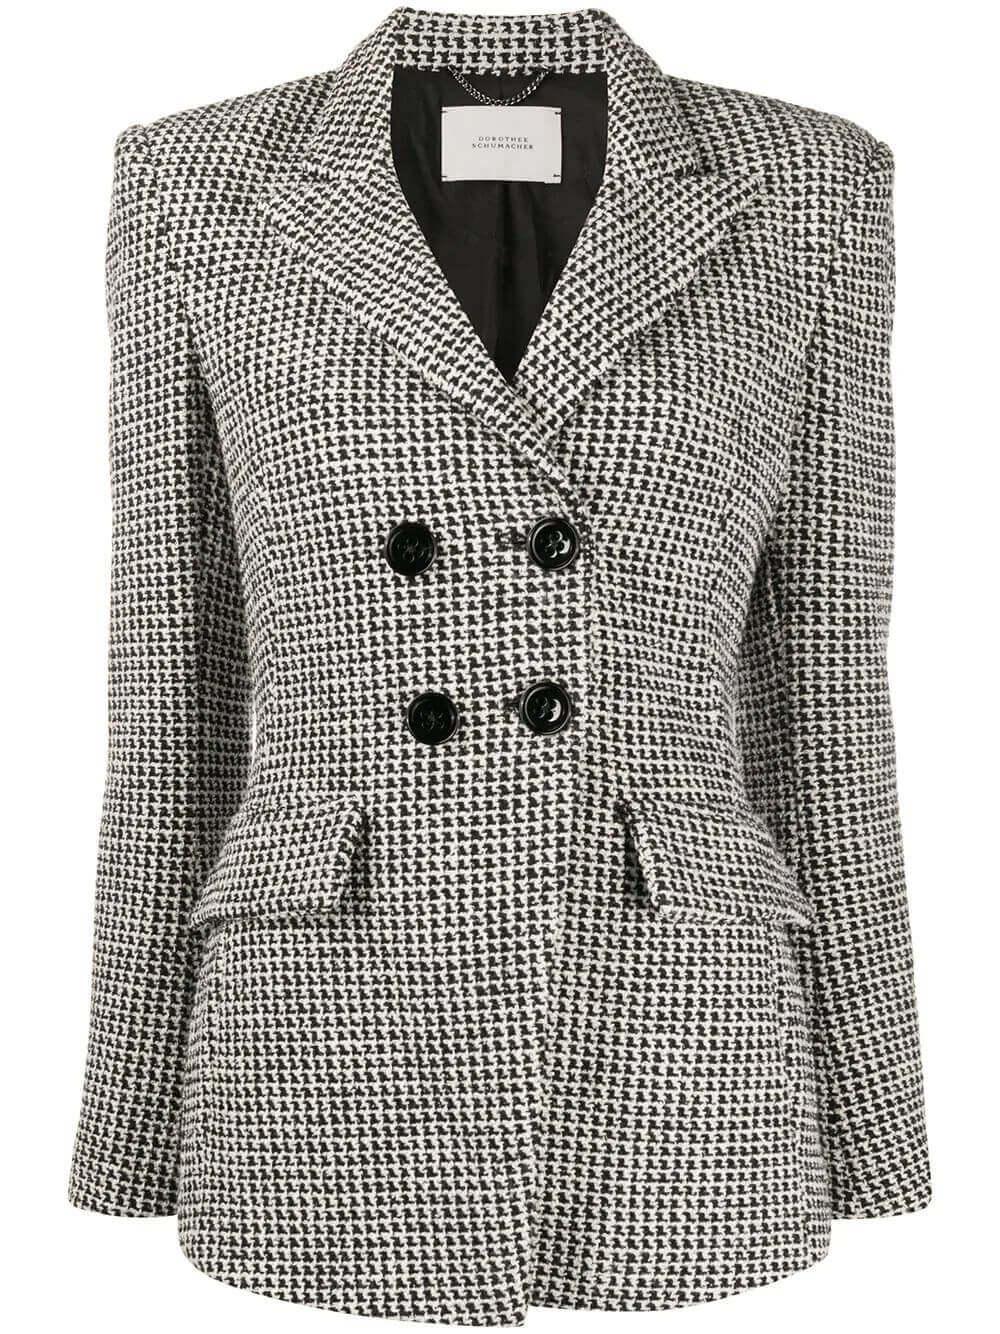 Checked Comfort Tweed Jacket Item # 940502